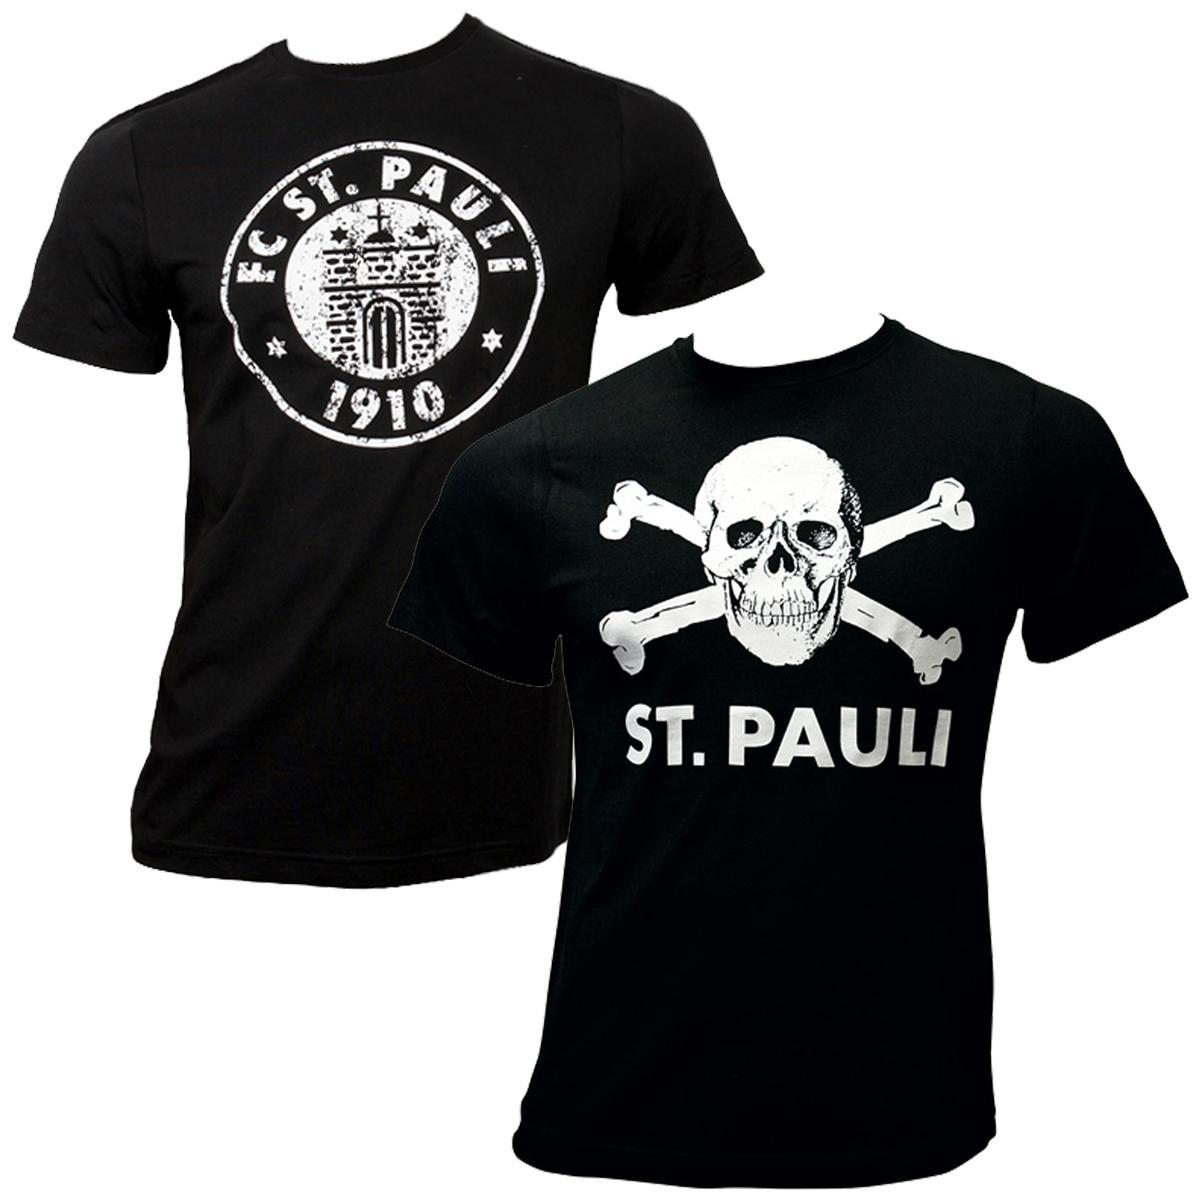 FC St. Pauli - T-Shirt Set Totenkopf & Logo - schwarz